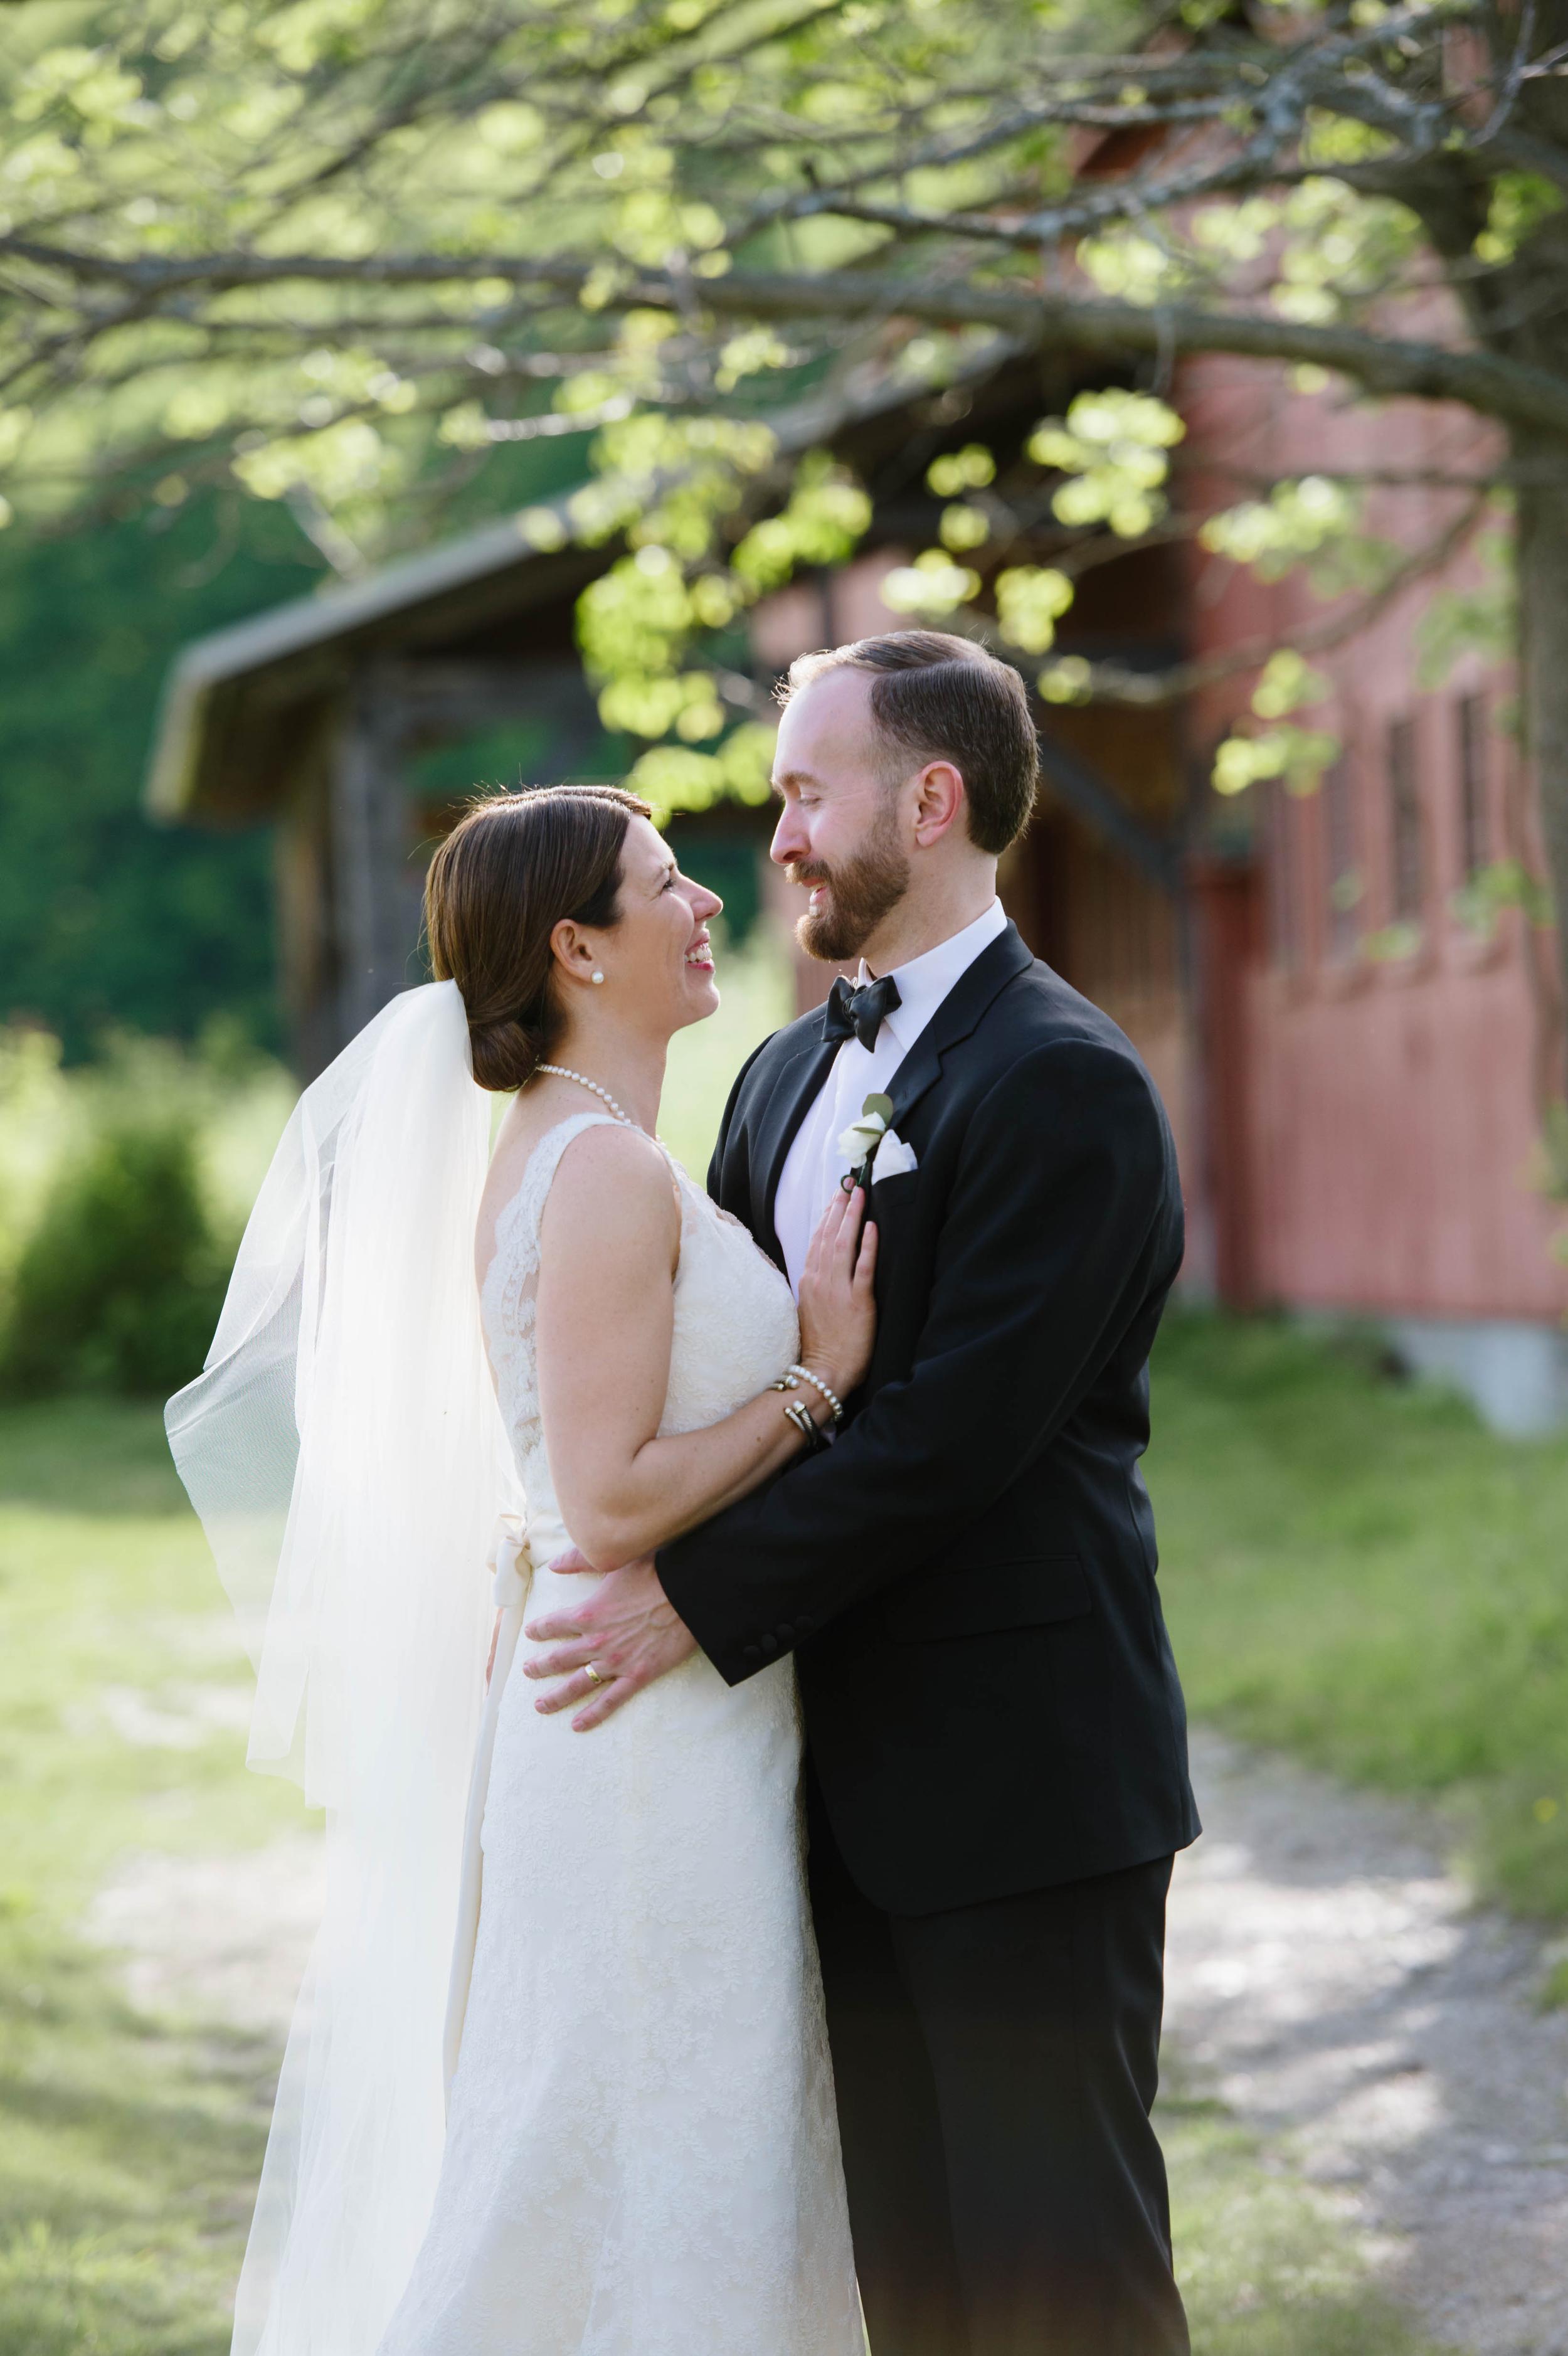 Quonquont_Farm_Wedding.jpg